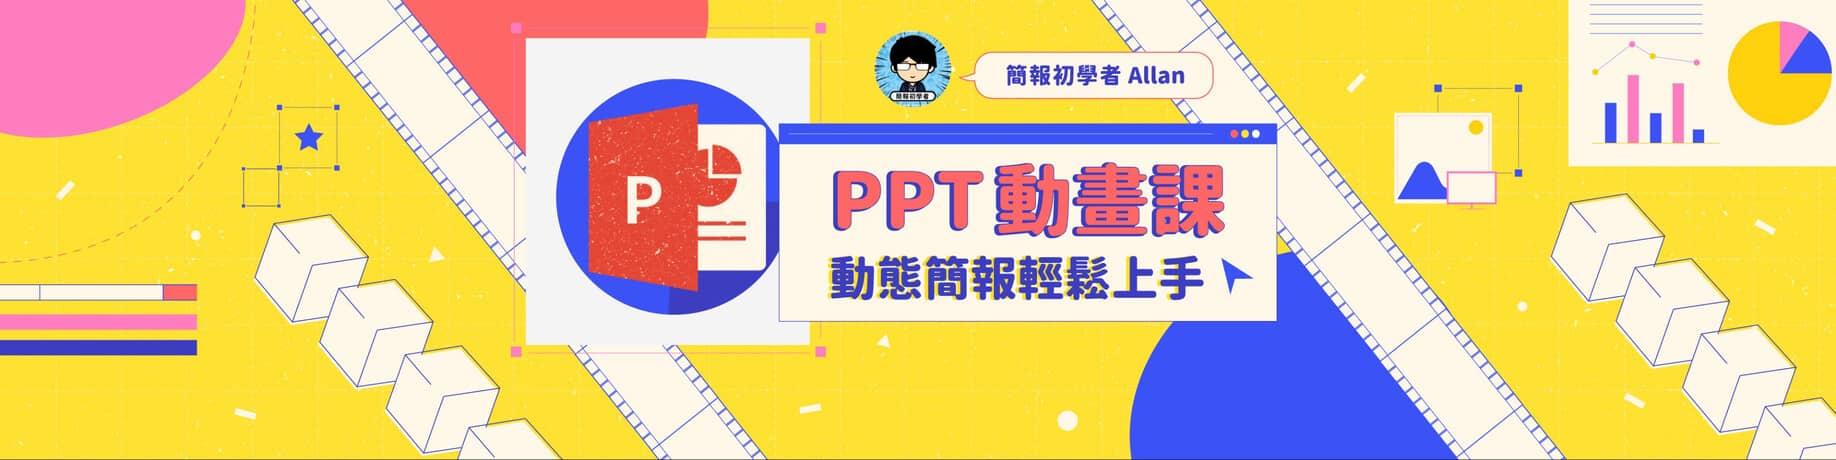 PPT 動畫課 動態簡報輕鬆上手